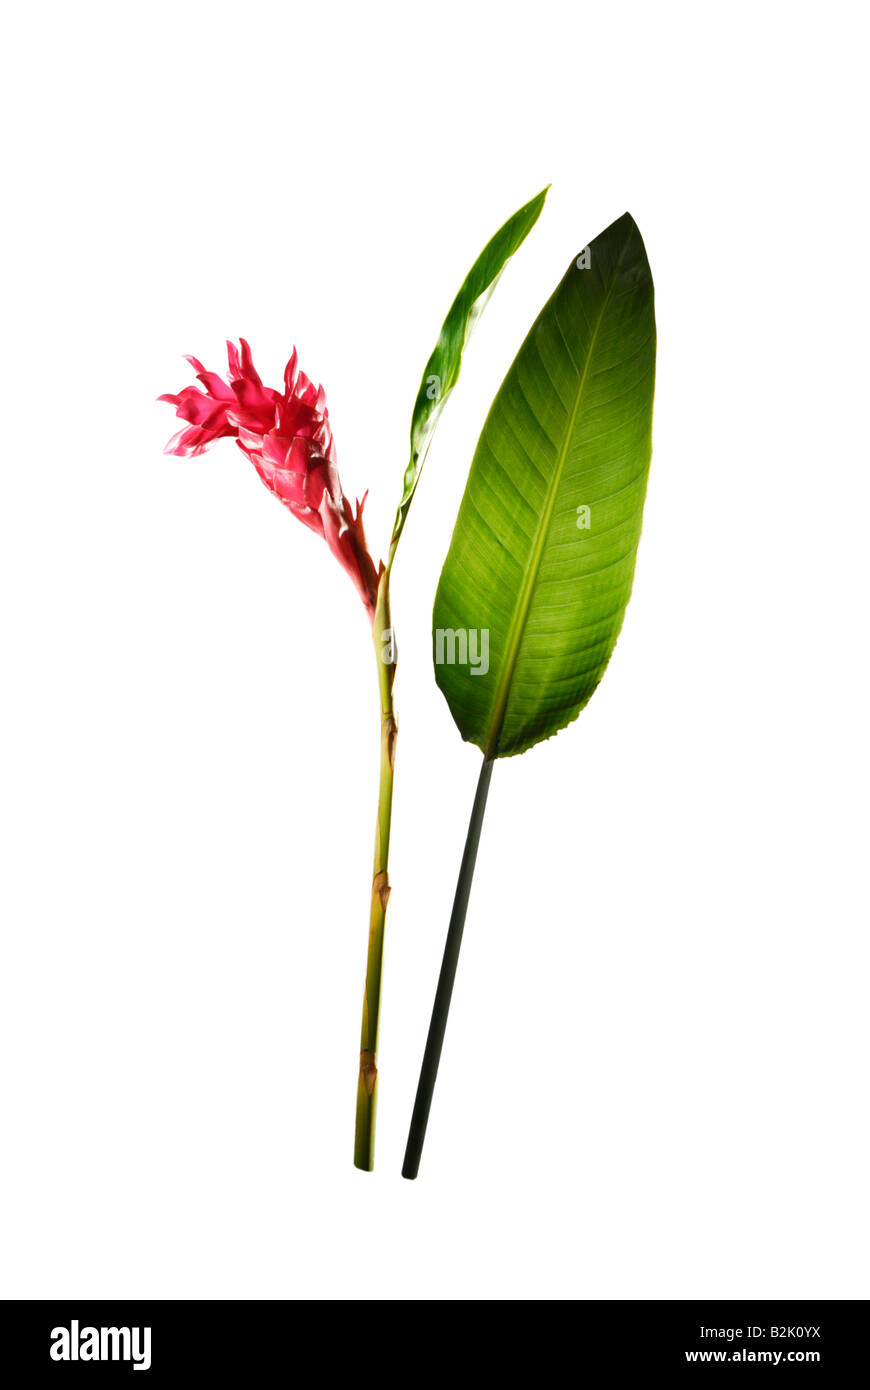 red ginger plant flower blossom of RAINFOREST forest rain leaf big giant white plain background studio shot - Stock Image